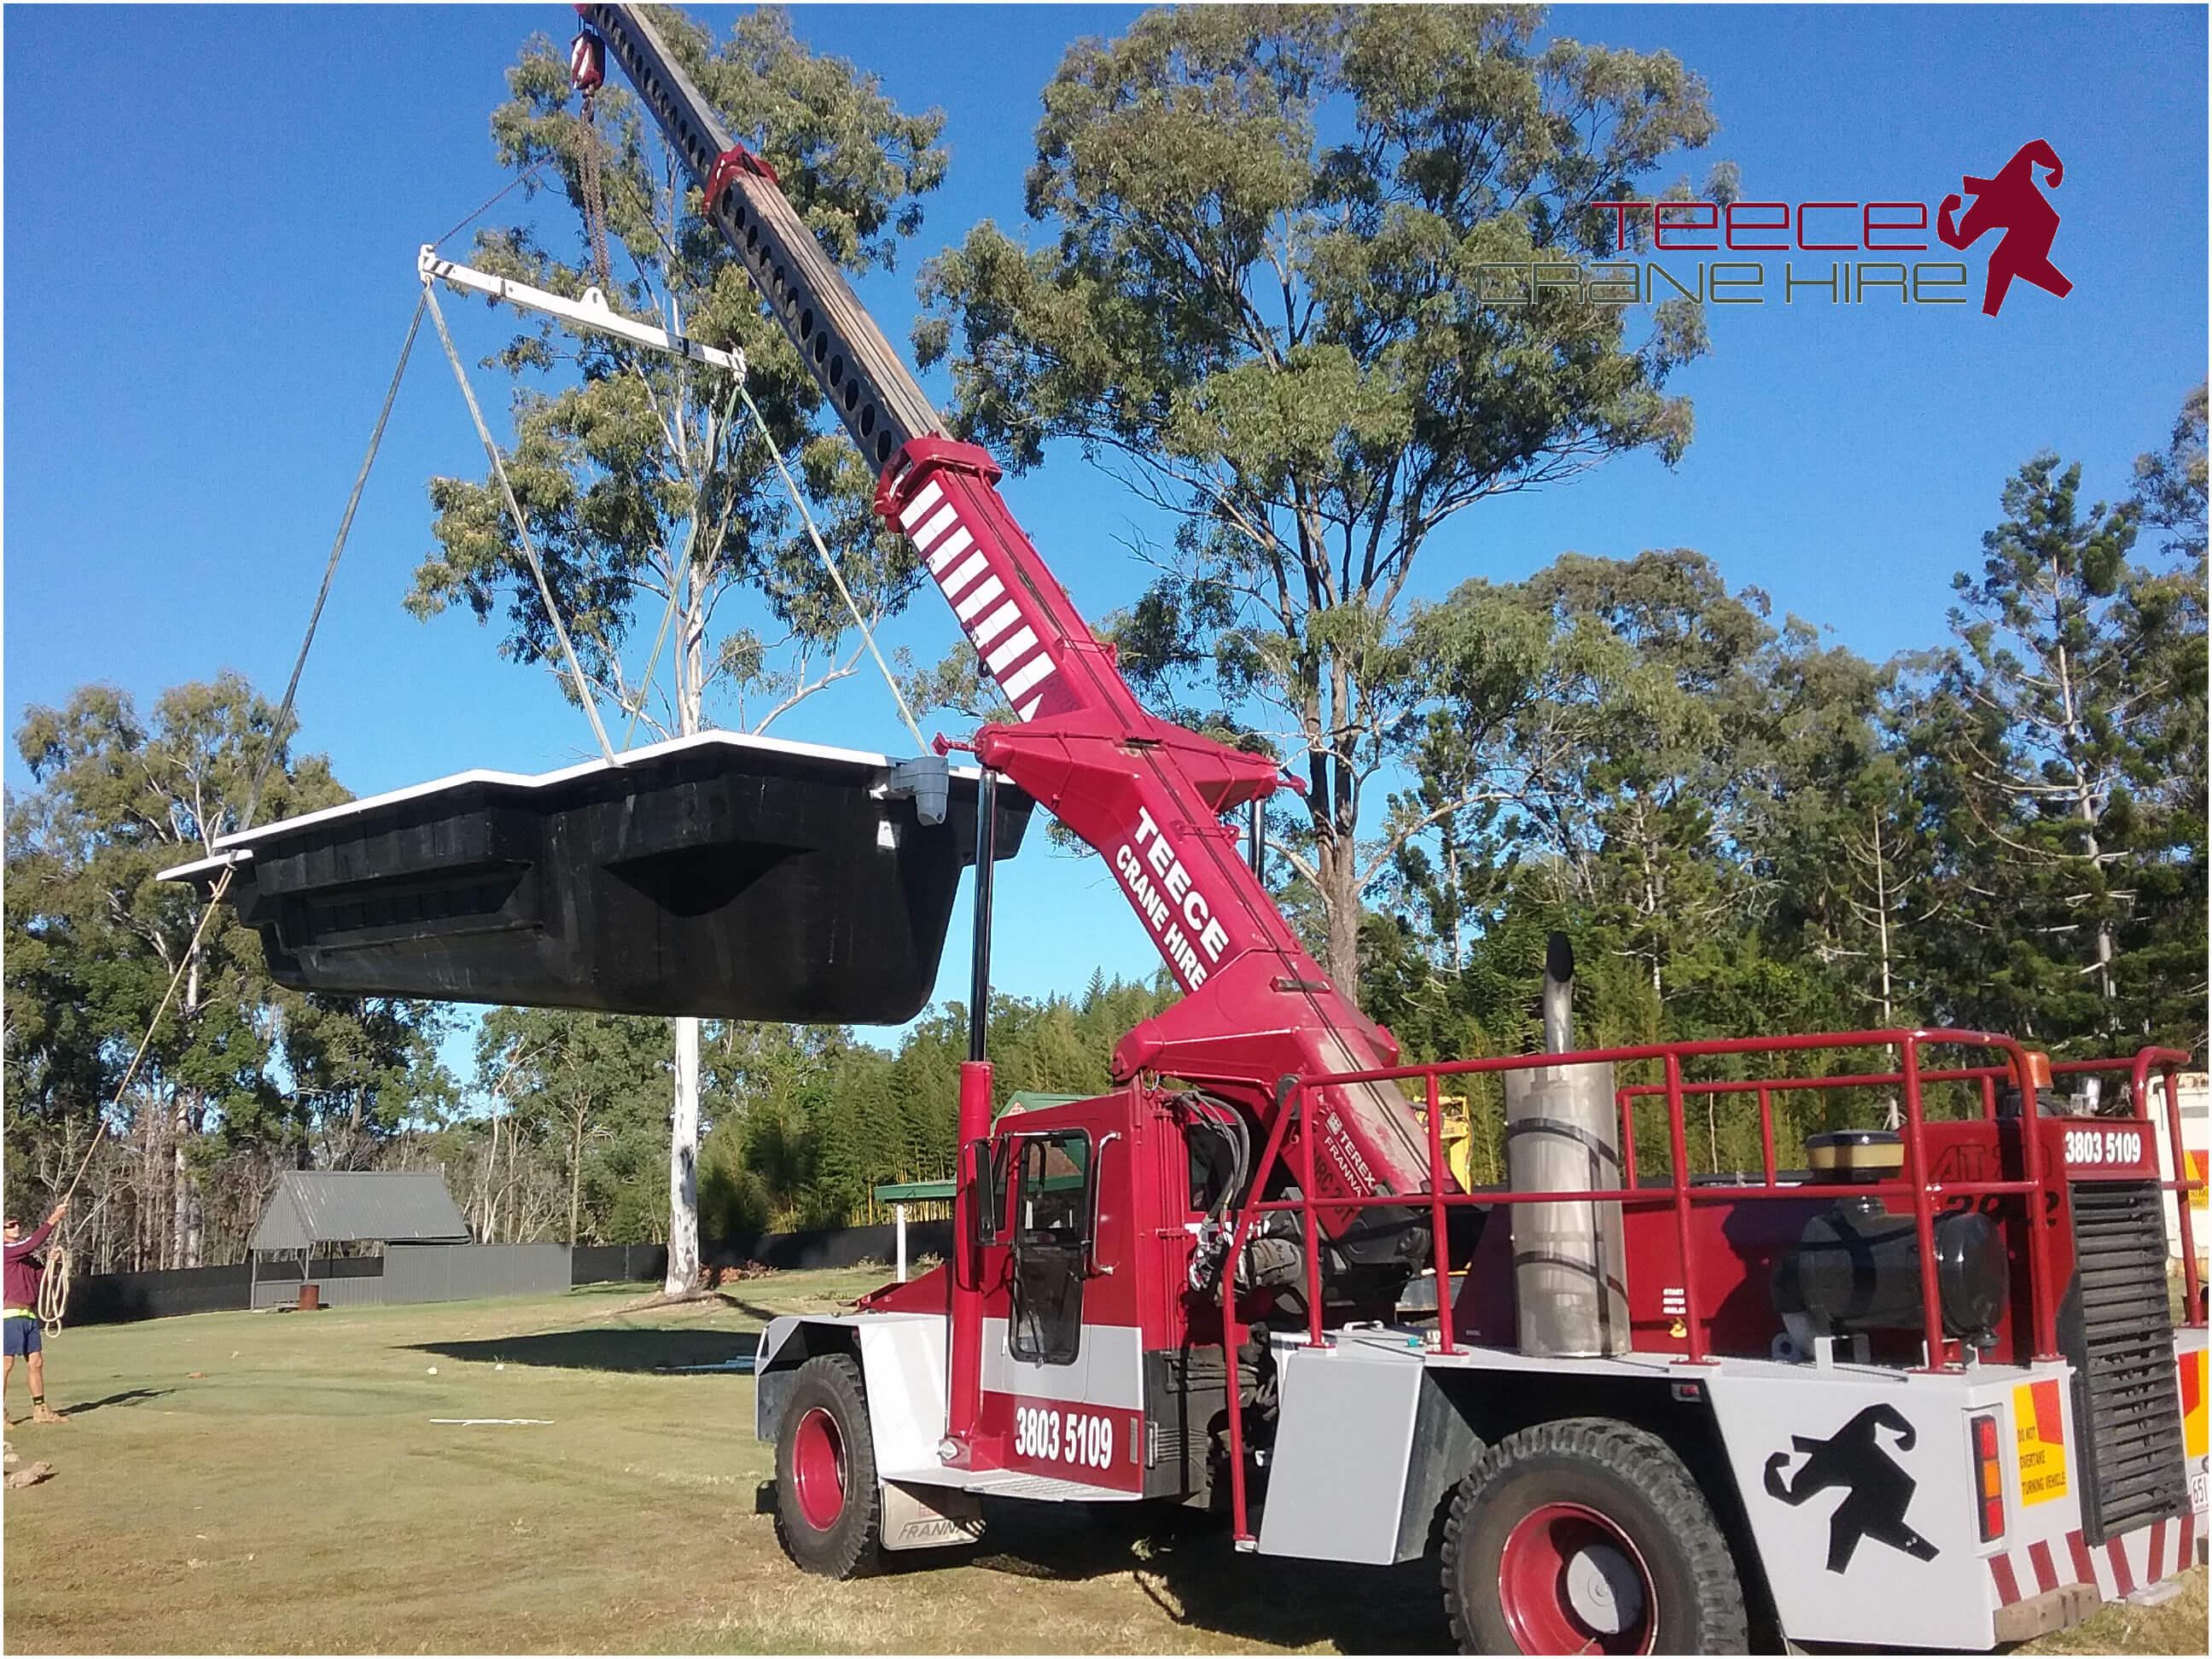 Teece Crane Hire - Mobile Crane - Brisbane